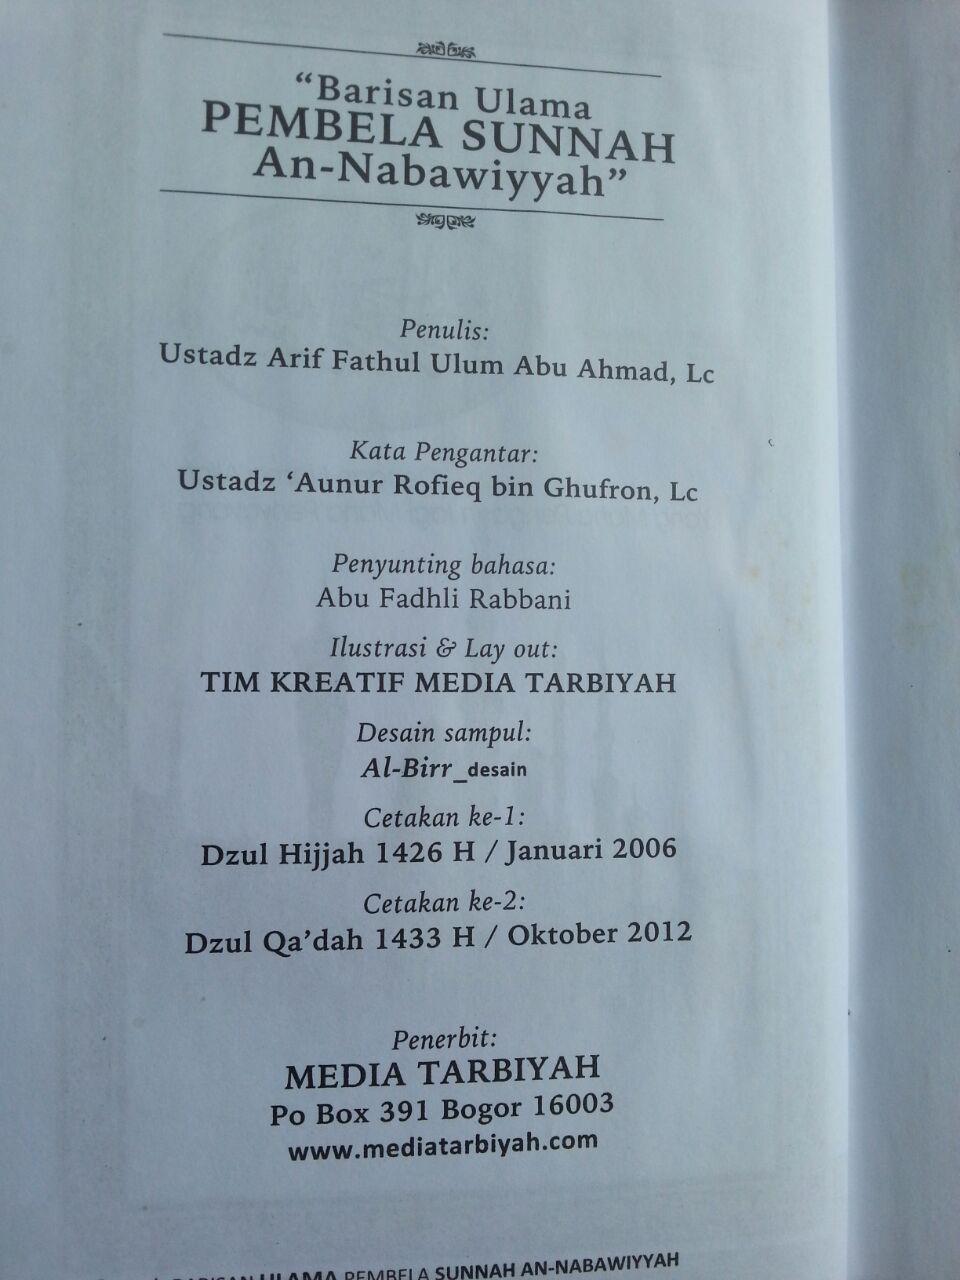 Buku Barisan Ulama Pembela Sunnah An-Nabawiyyah isi